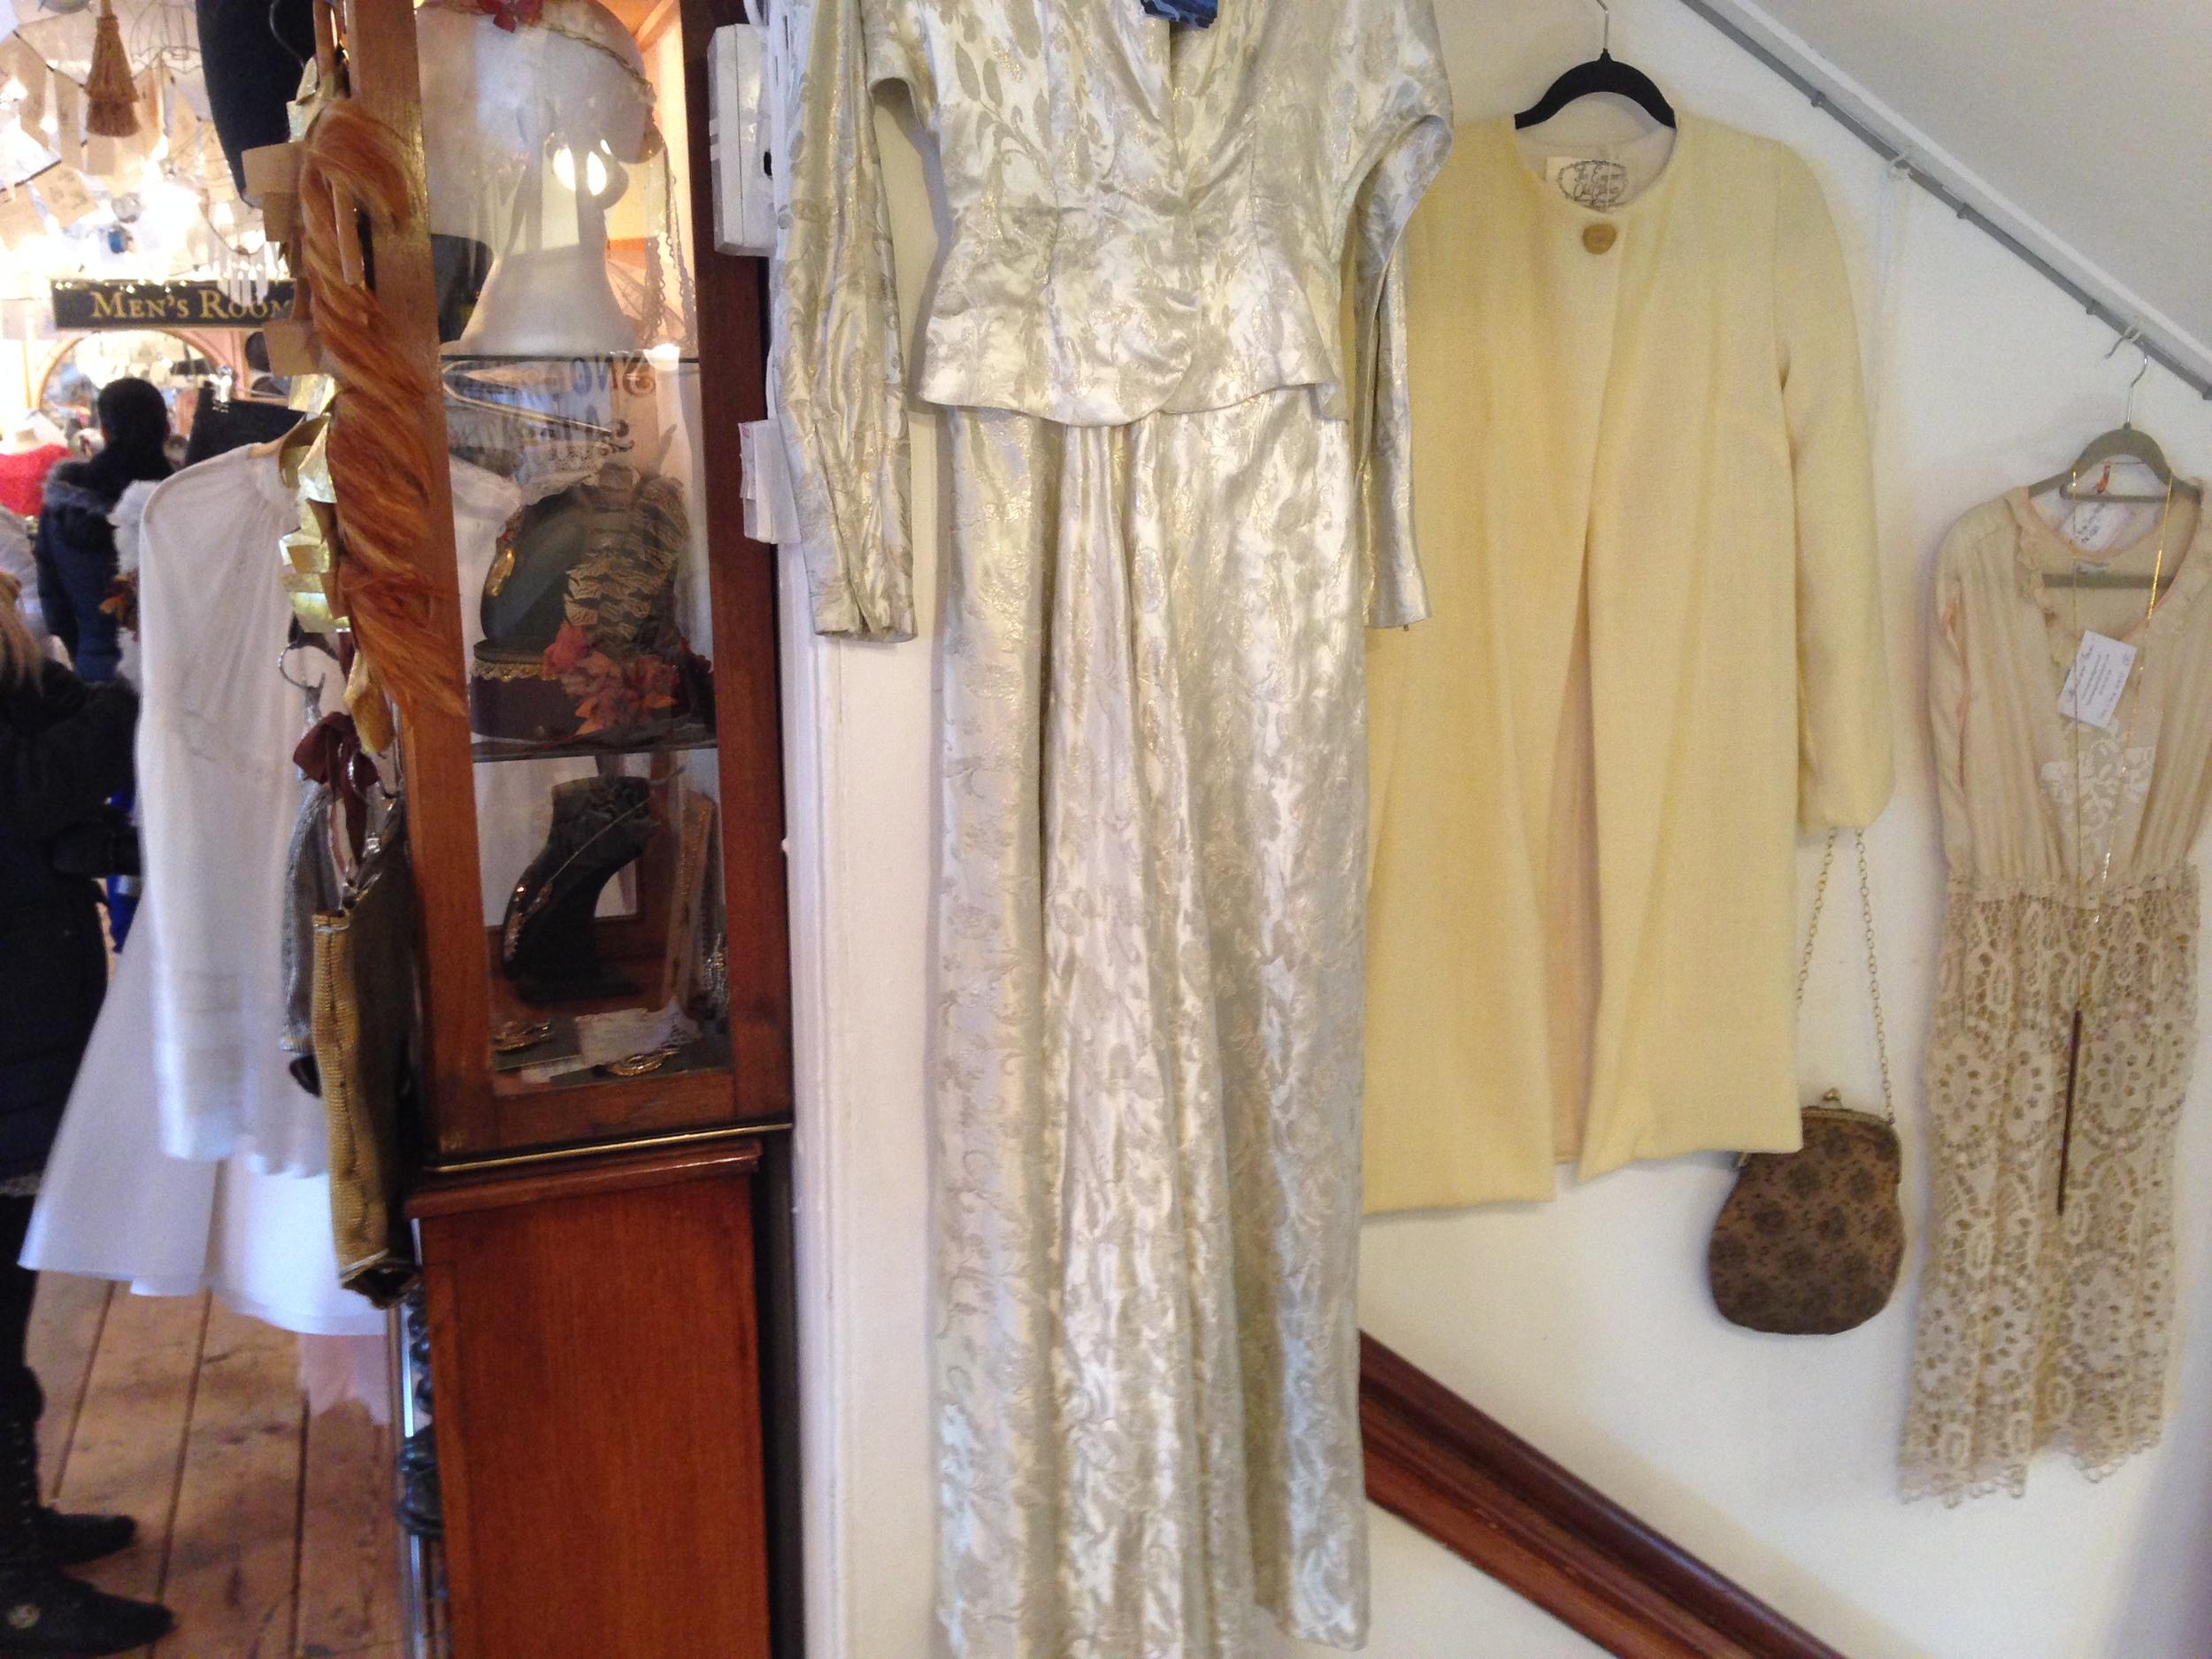 Emperor's Lemon Coat on the stairwell